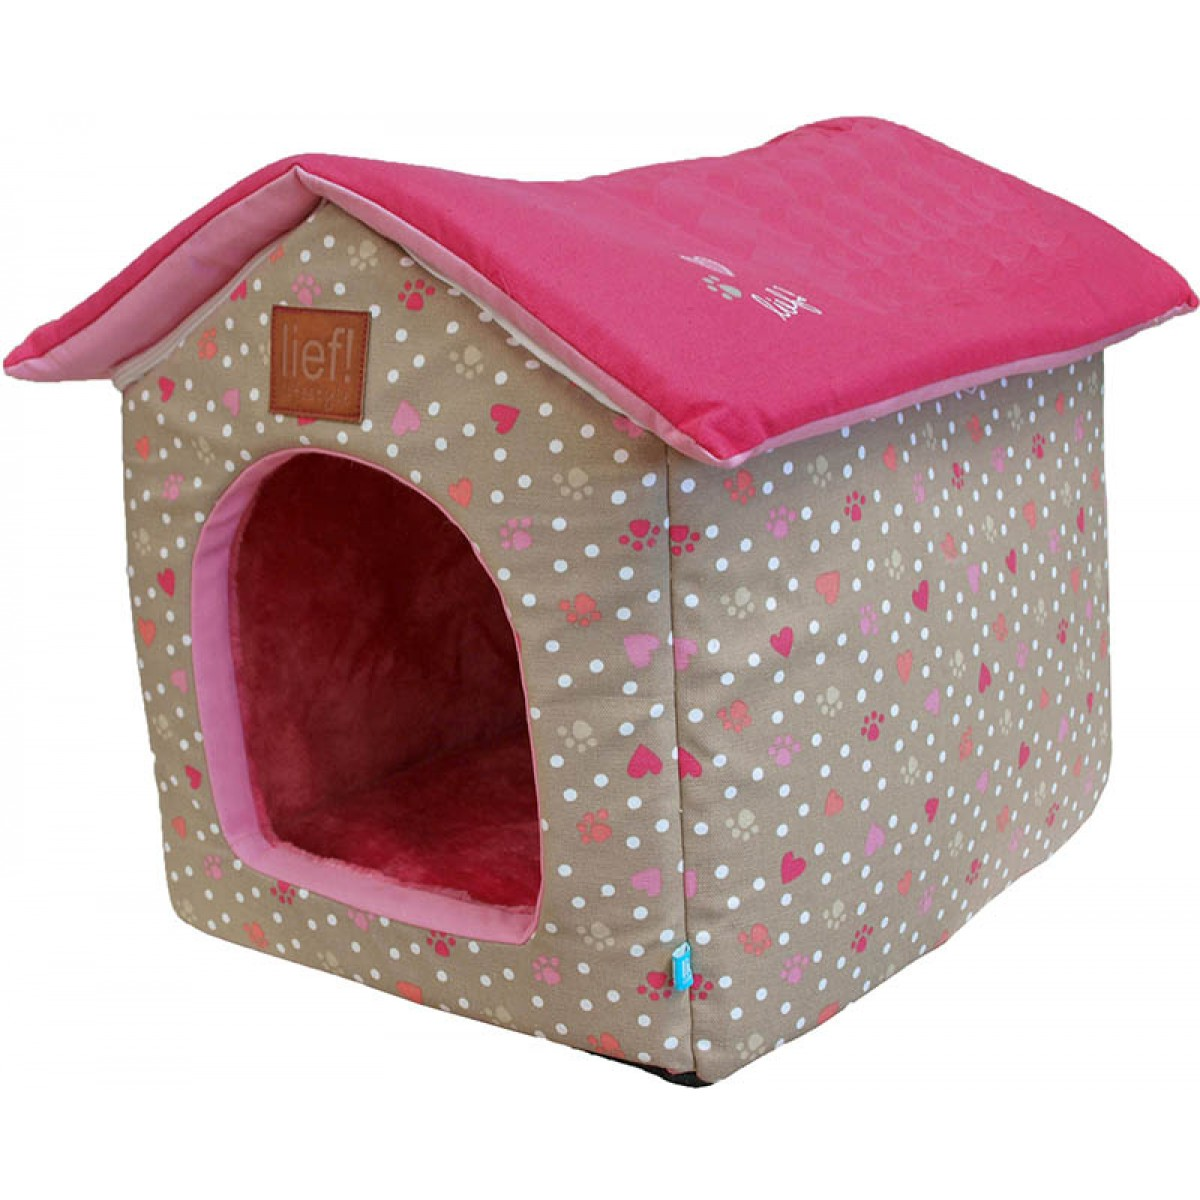 Konijnen huis lief roze